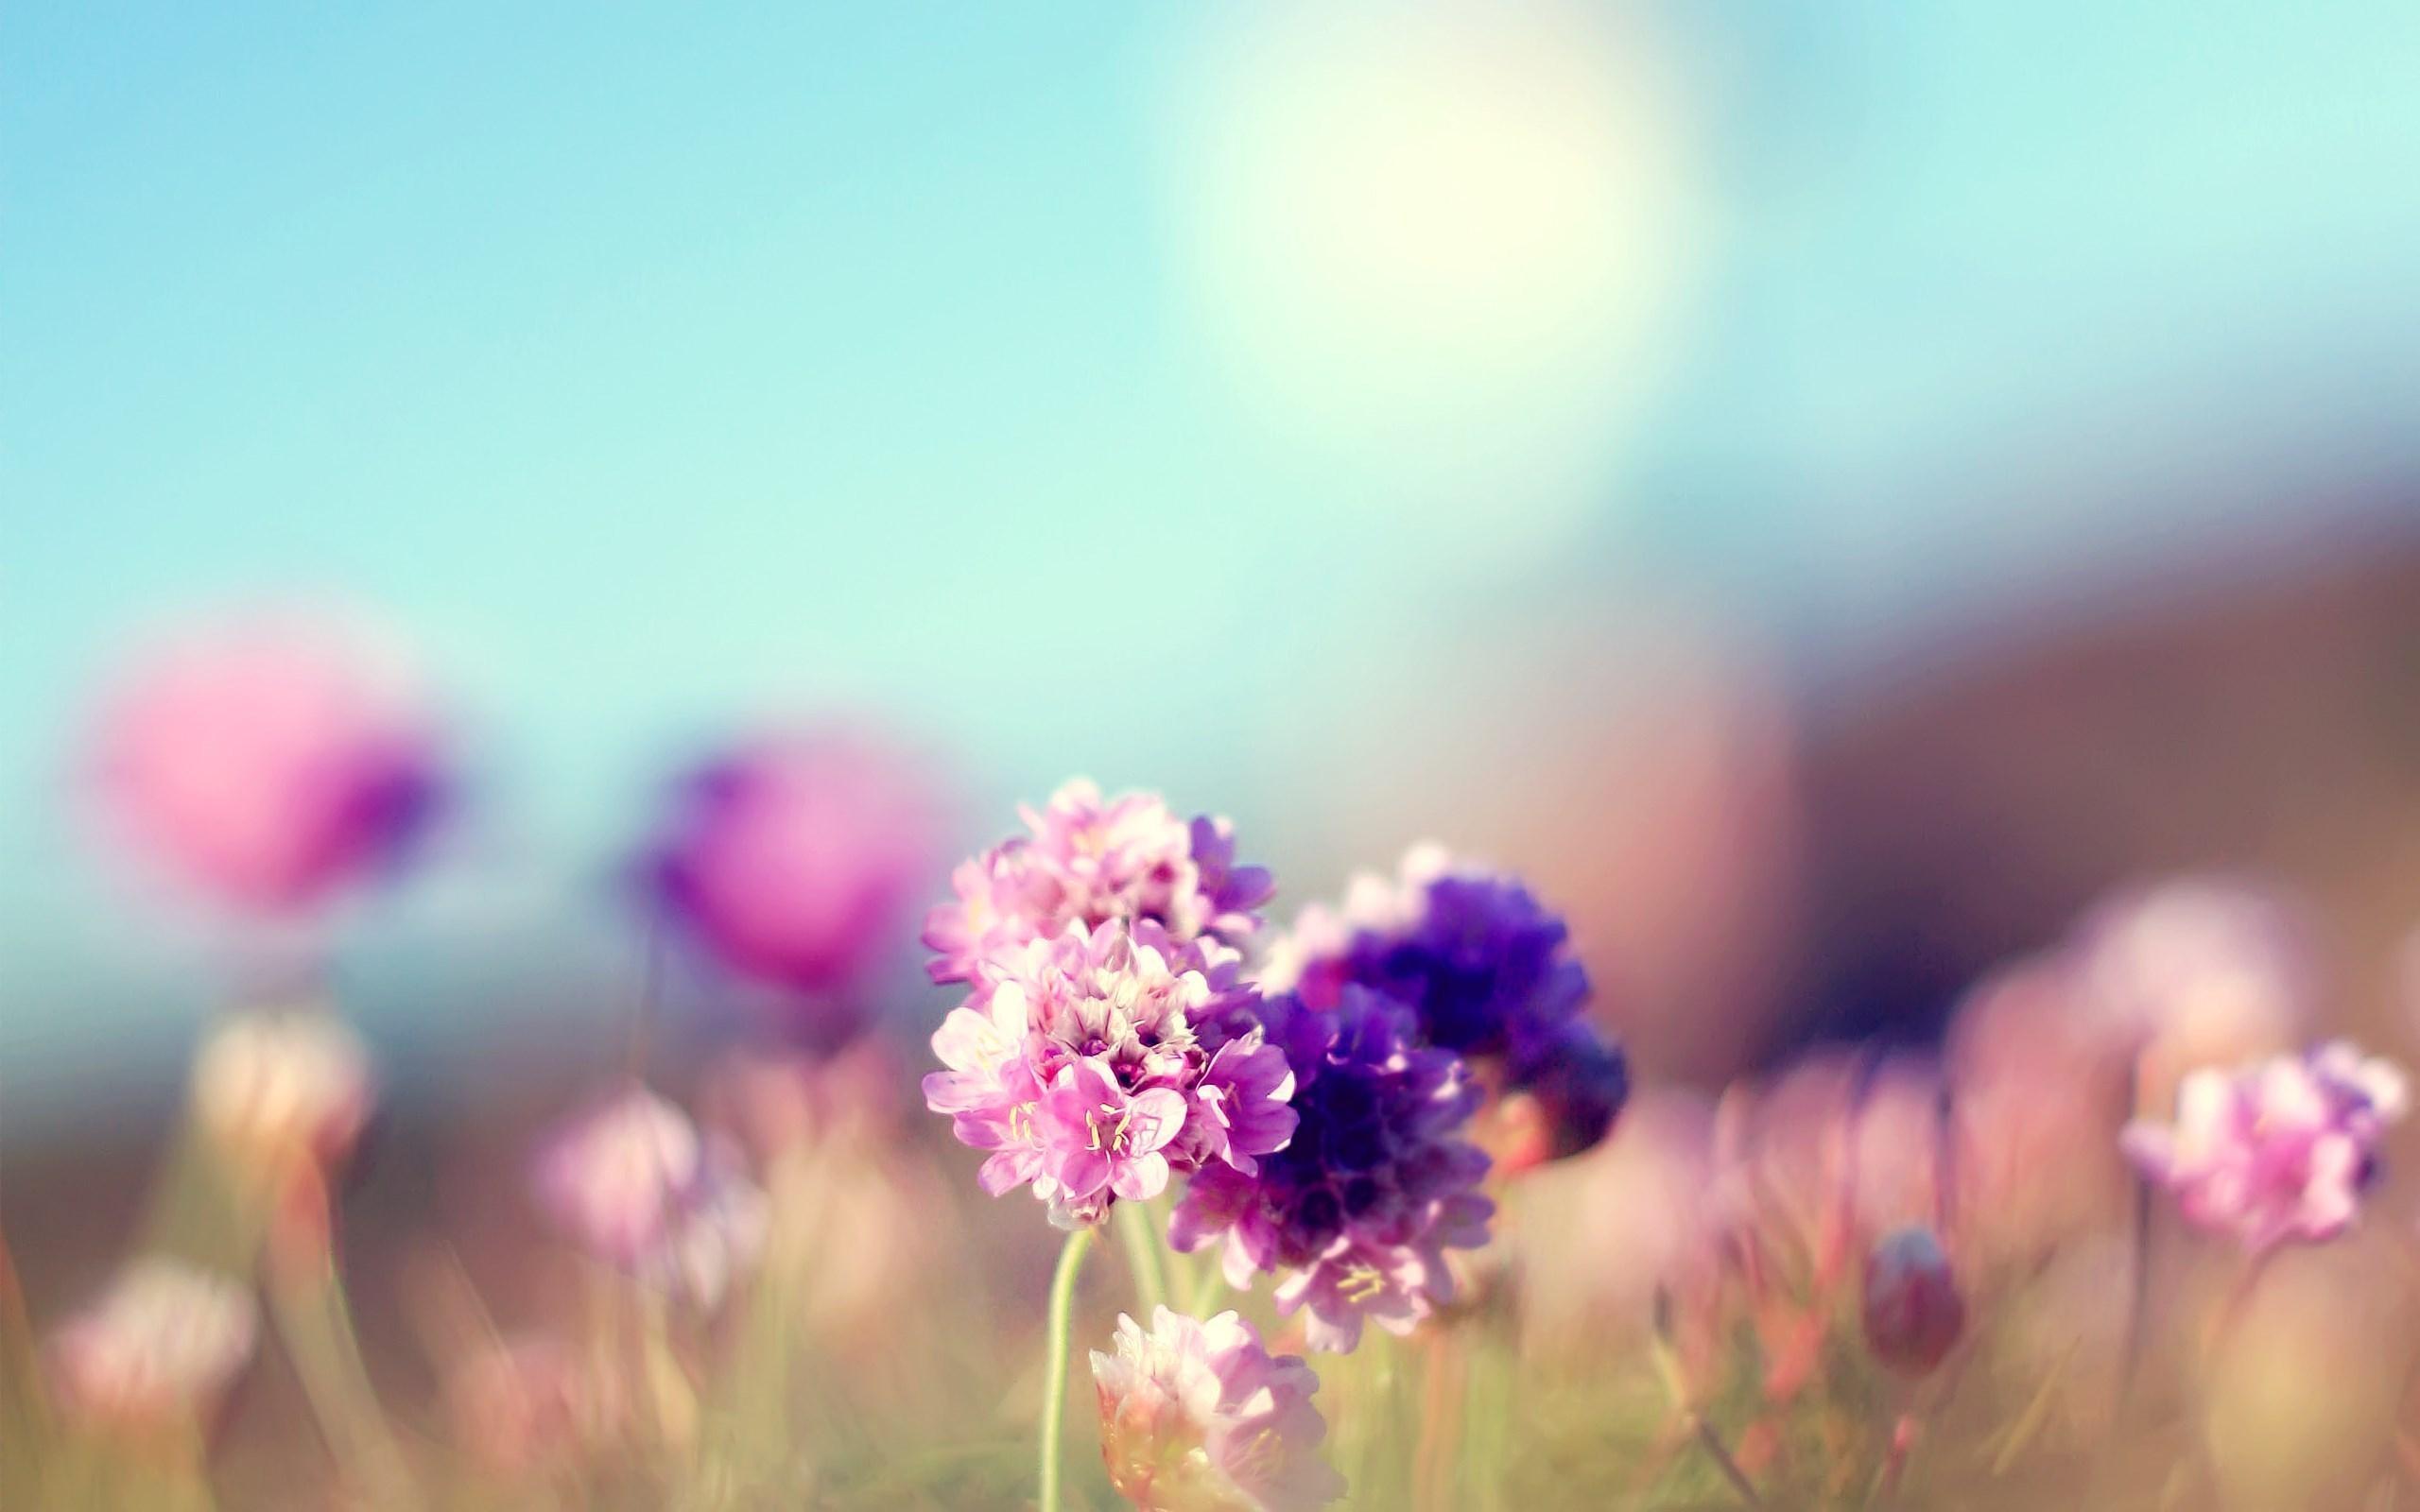 Flowers Field Nature Sunny Mac Wallpaper Download